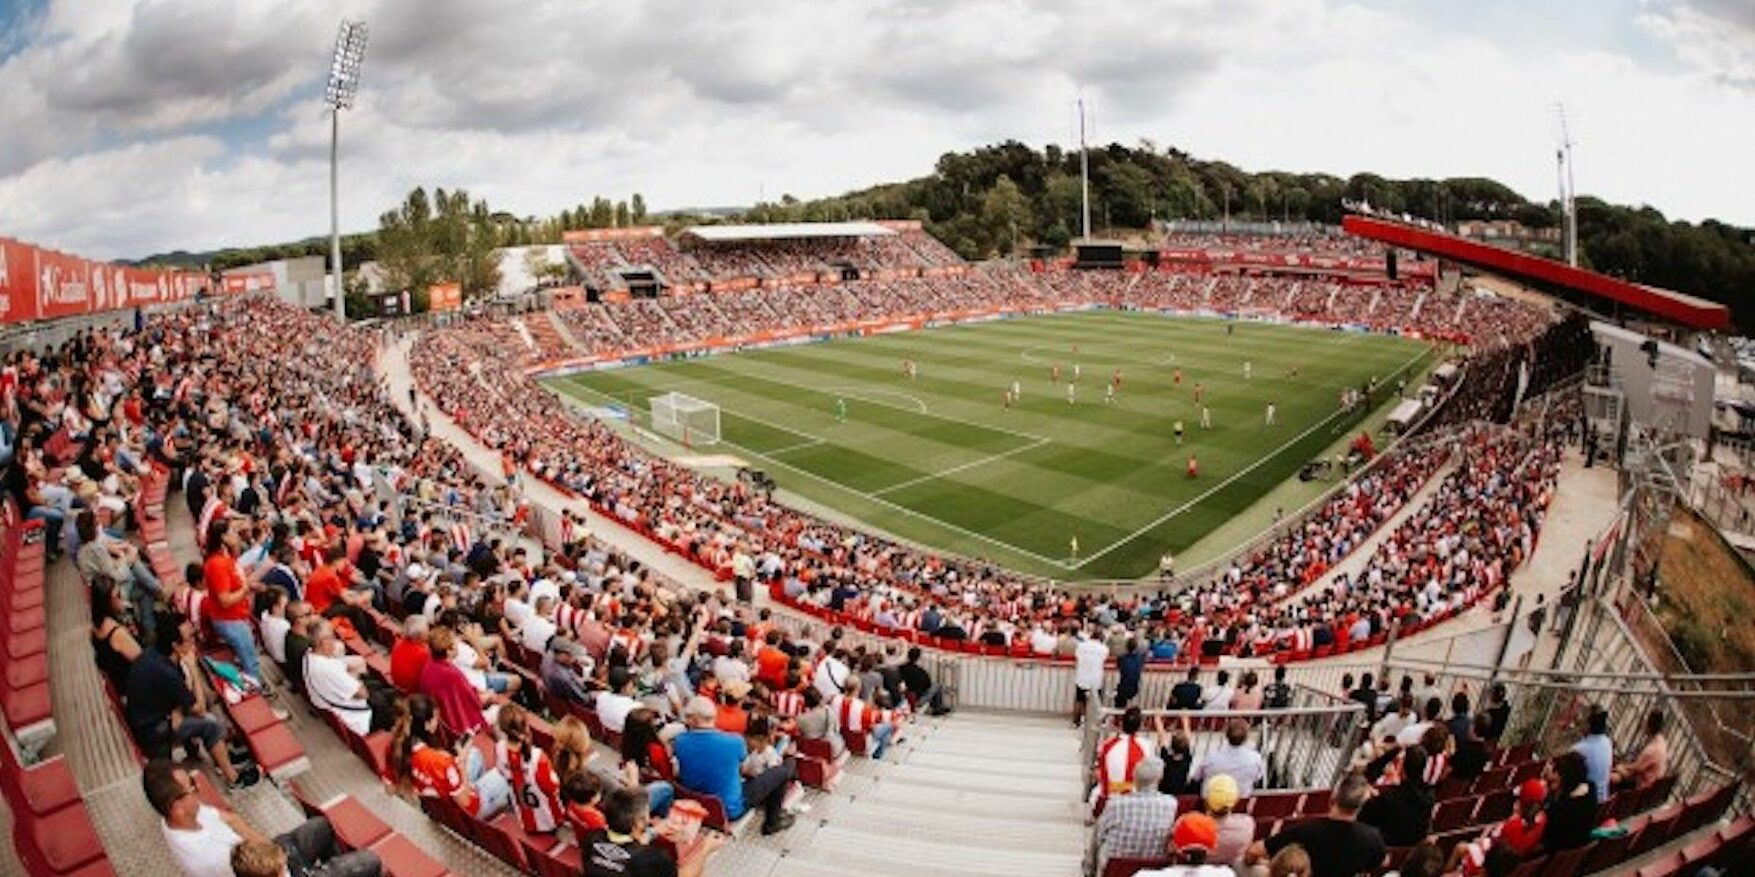 Montilivi, durant un partit |Girona FC